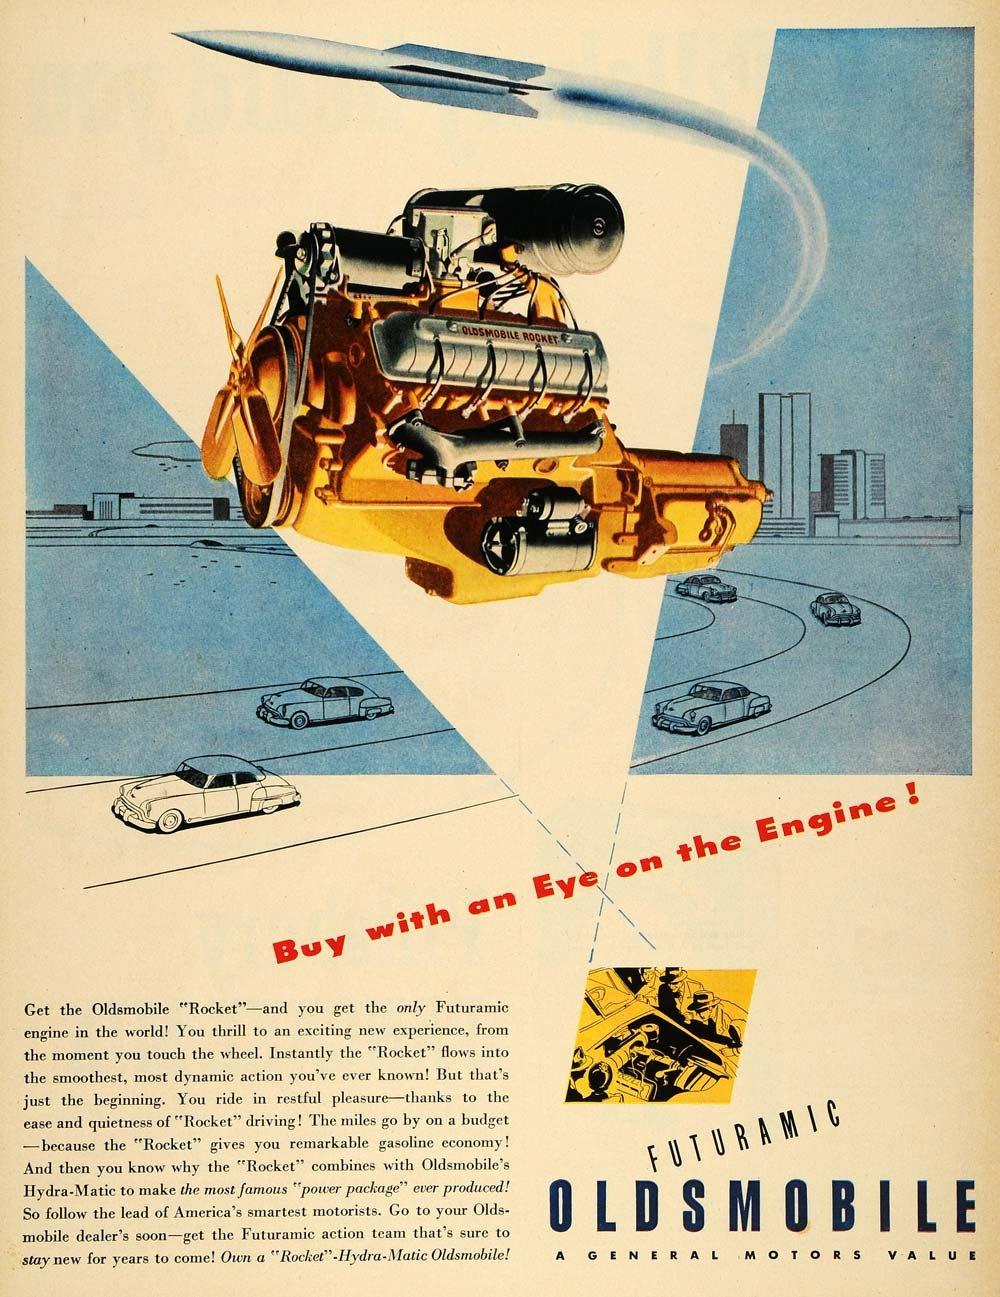 Oldsmobile futuramic rocket engine ad